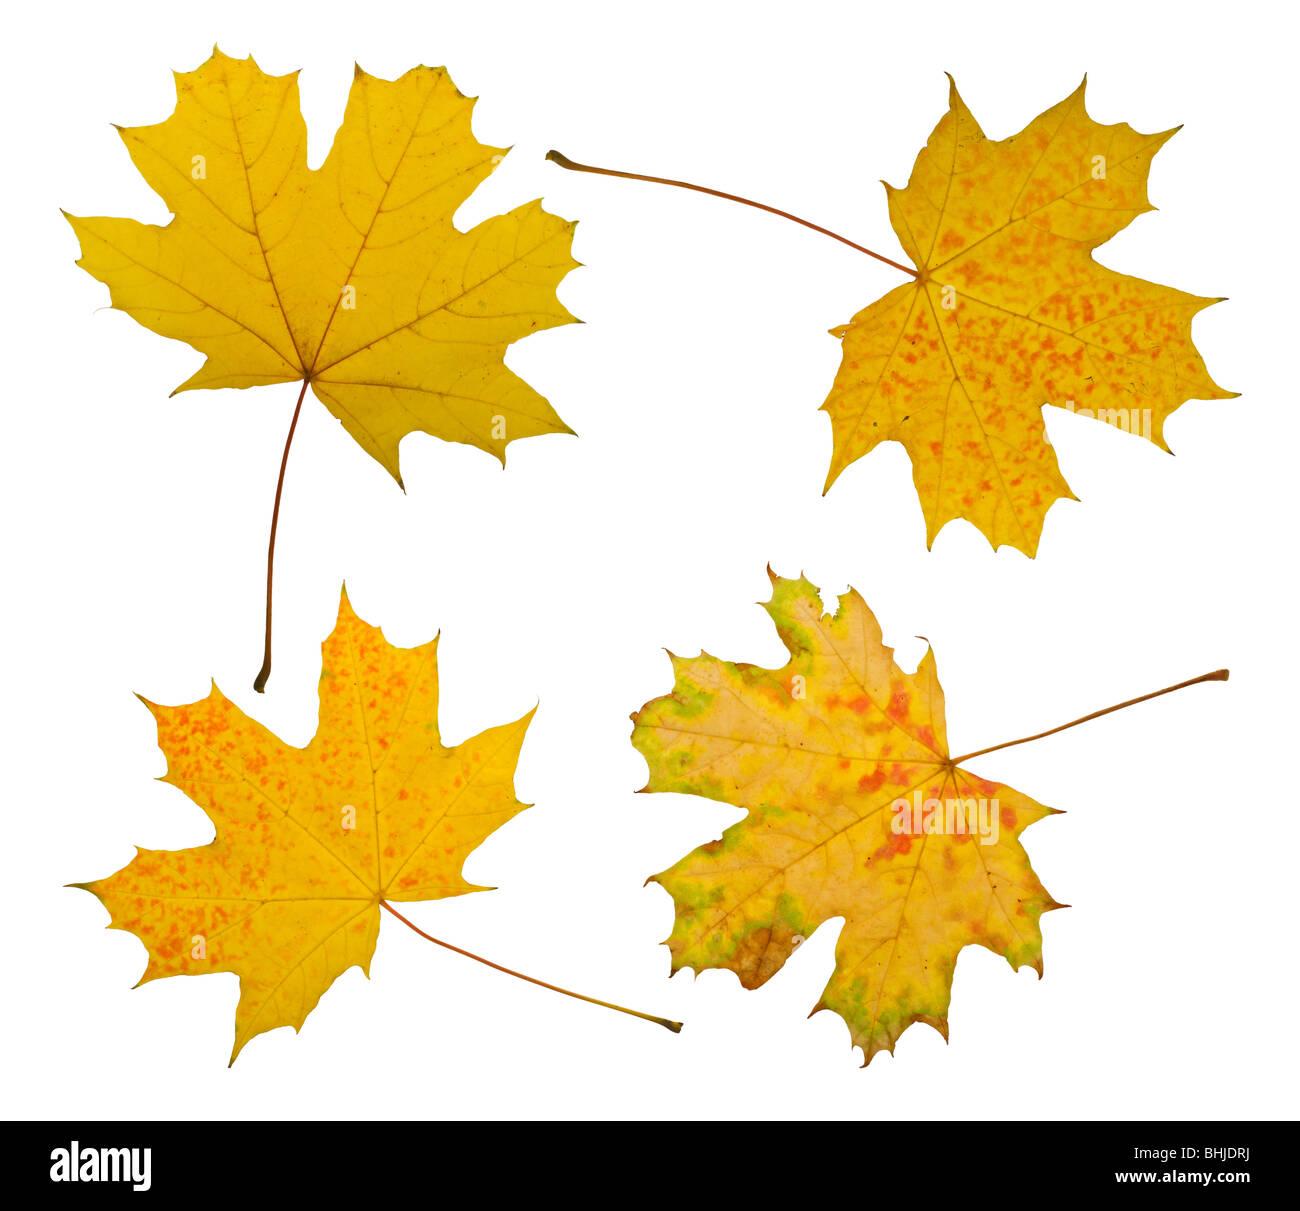 Maple leaves isolated on white background - Stock Image